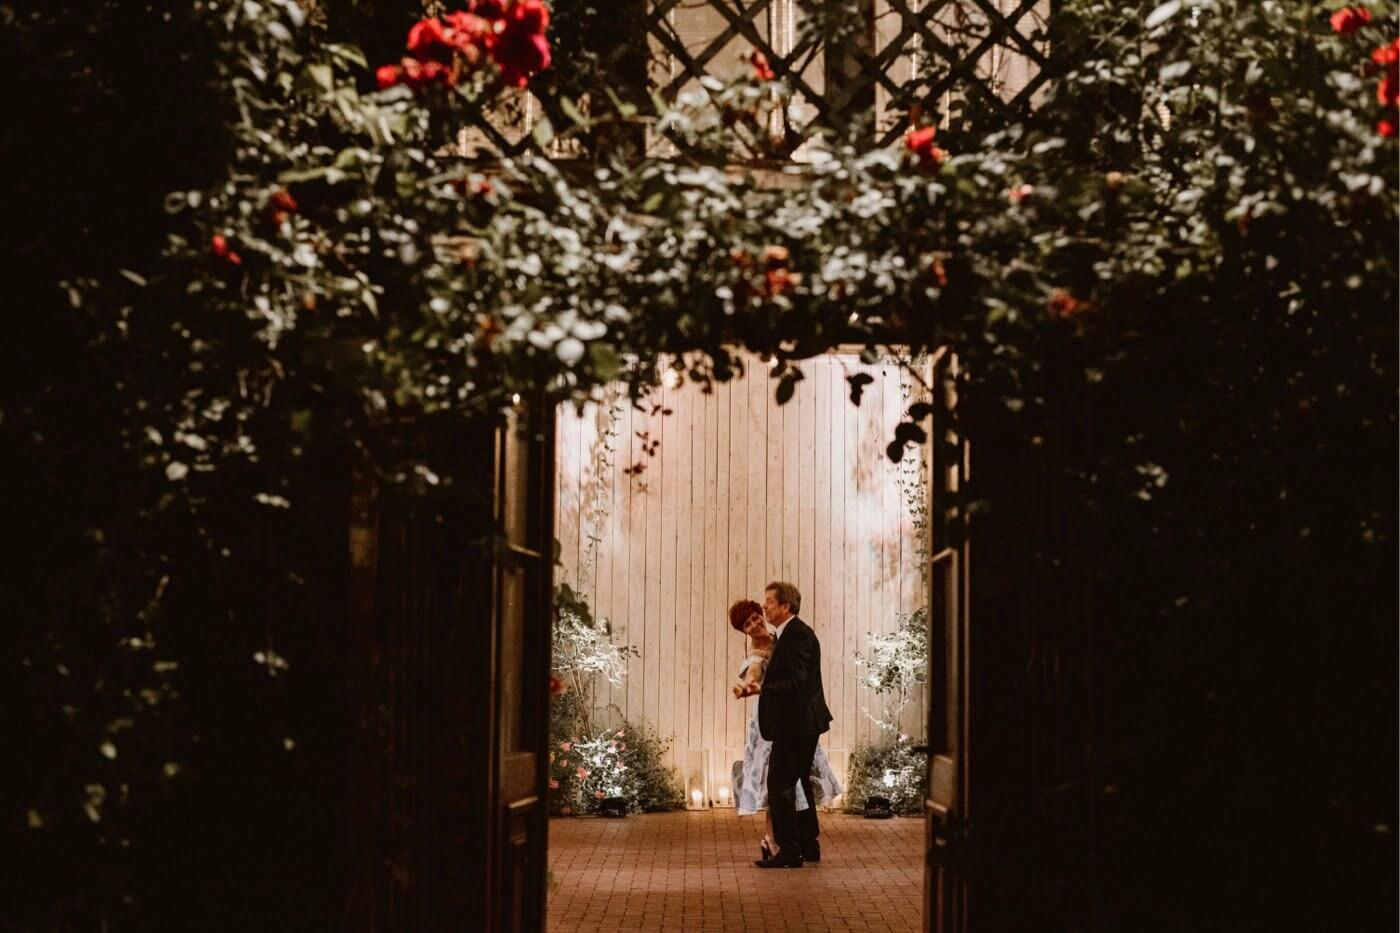 ewelina zieba rustykalne wesele stara oranzeria warszawa 087